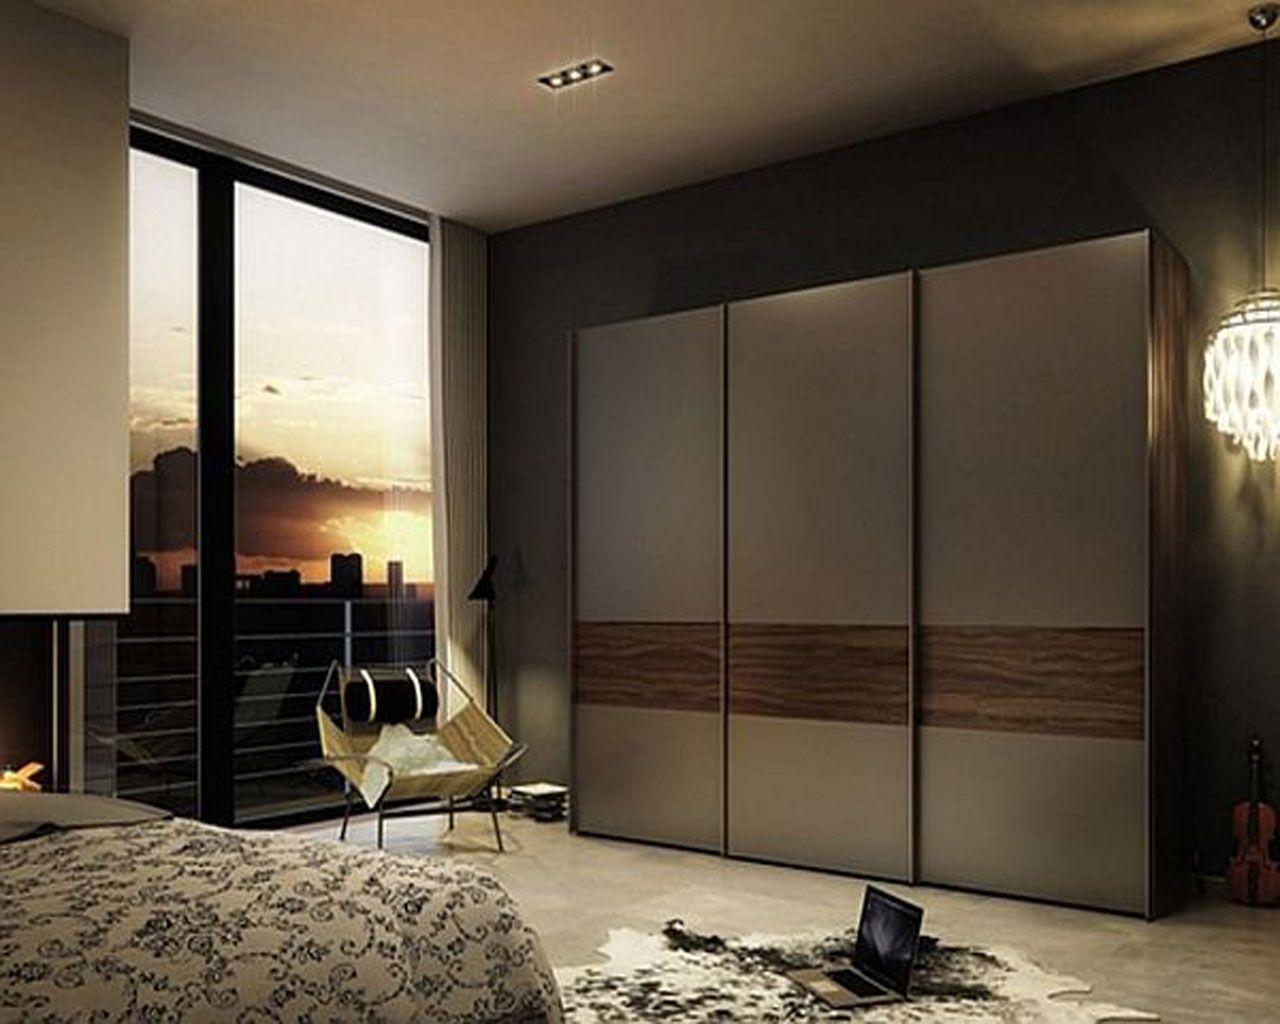 Fitted Sliding Wardrobe Doors For Bedroom Furniture